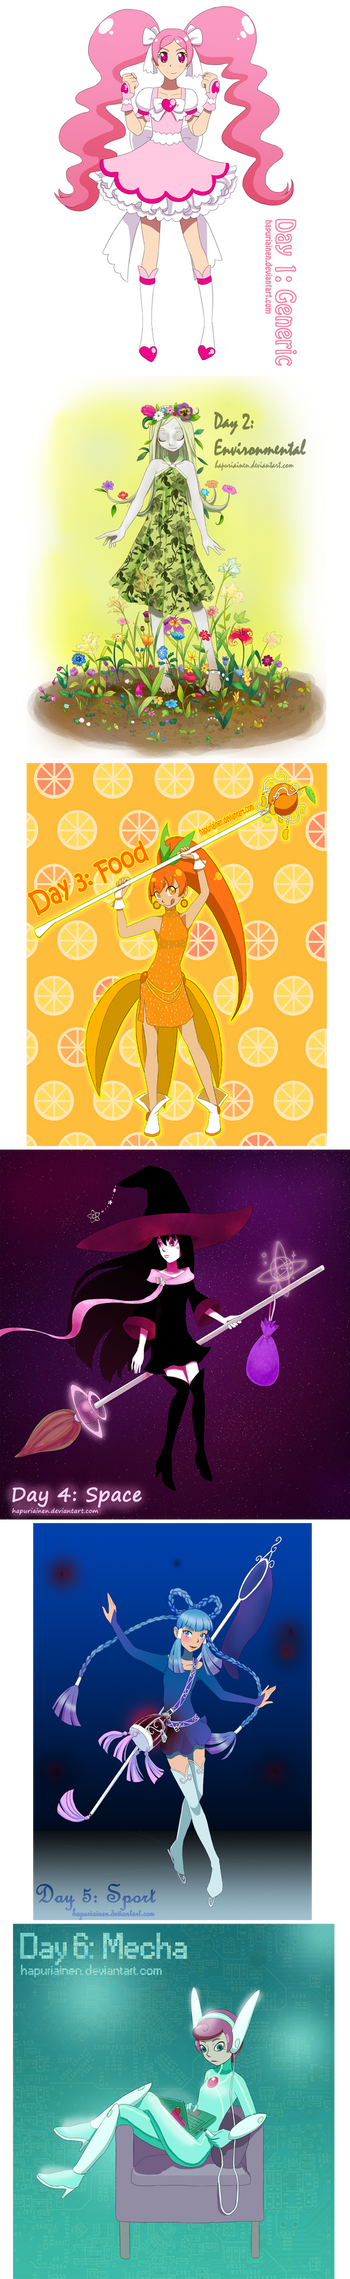 Magical girl challenge 1/3 by Hapuriainen